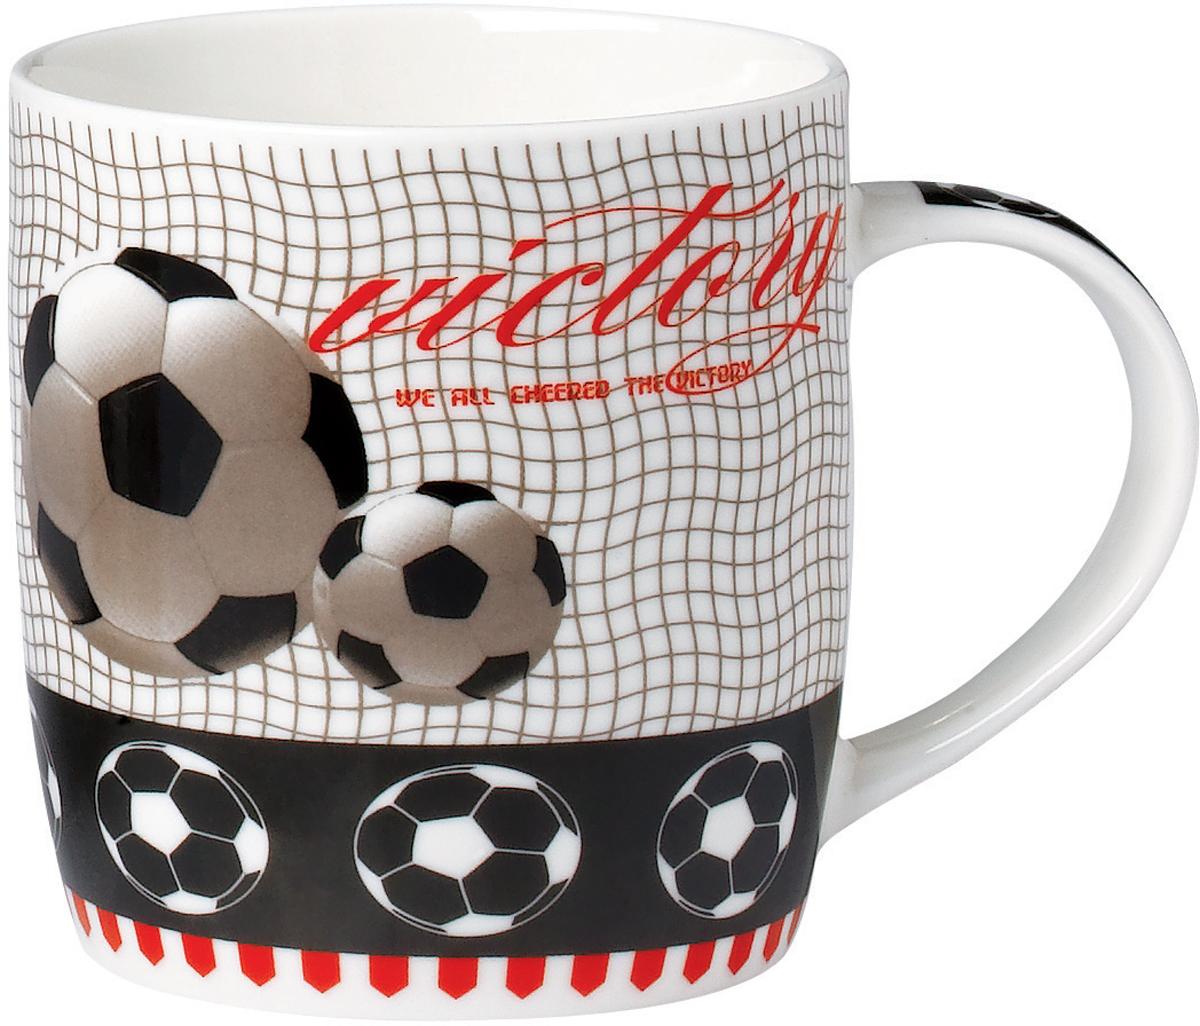 Кружка Rainbow Футбол, 350 мл. TLND1-85 кружка кофе 350 мл nuova r2s s p a кружка кофе 350 мл